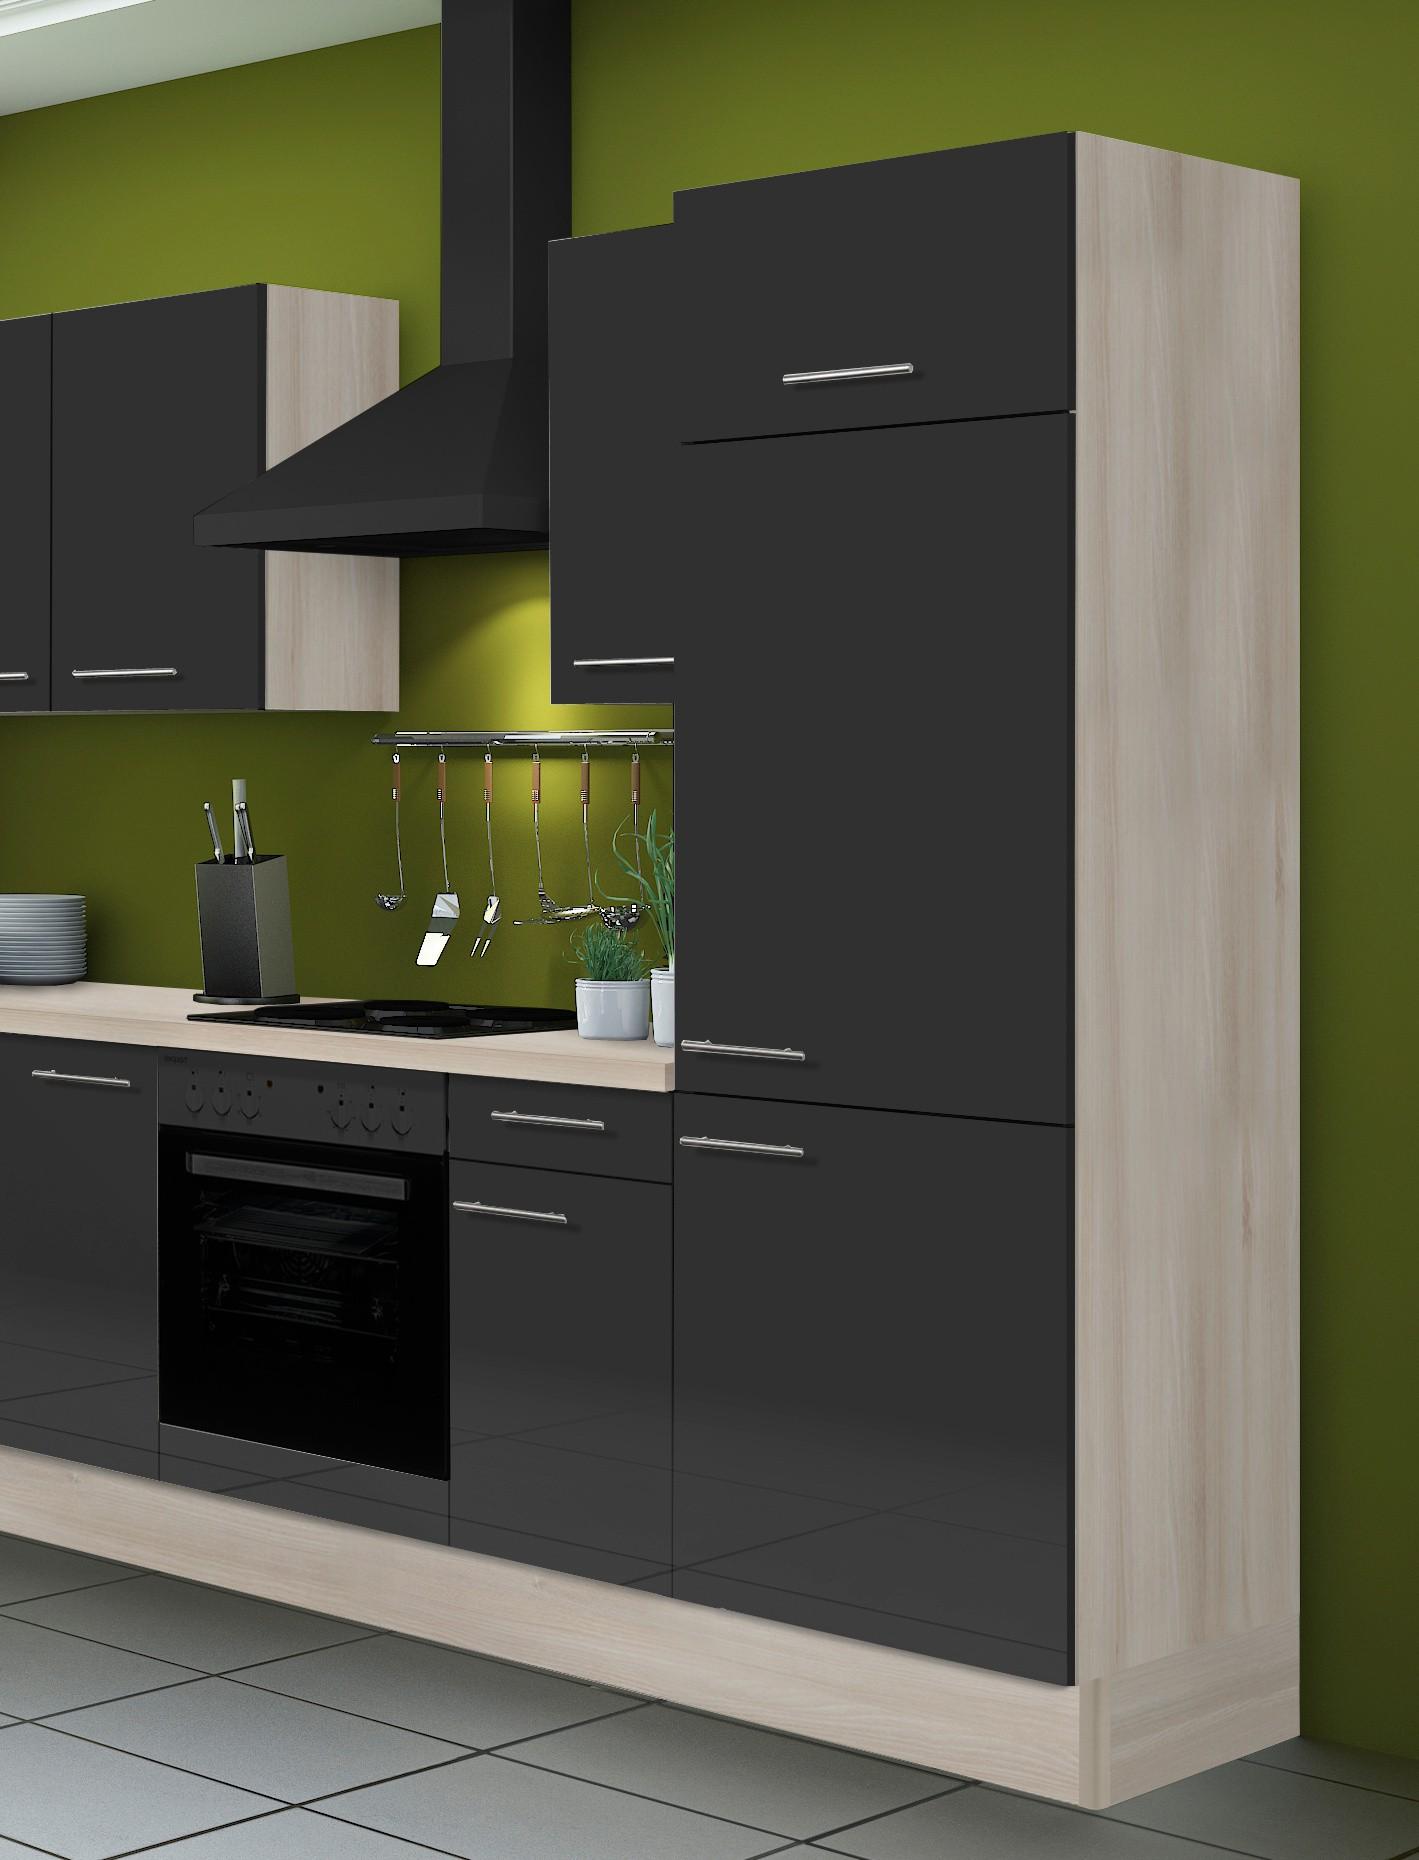 eckk che leon vario 1 l k che ohne e ger te breite 270 x 165 cm braun k che k chenzeilen. Black Bedroom Furniture Sets. Home Design Ideas